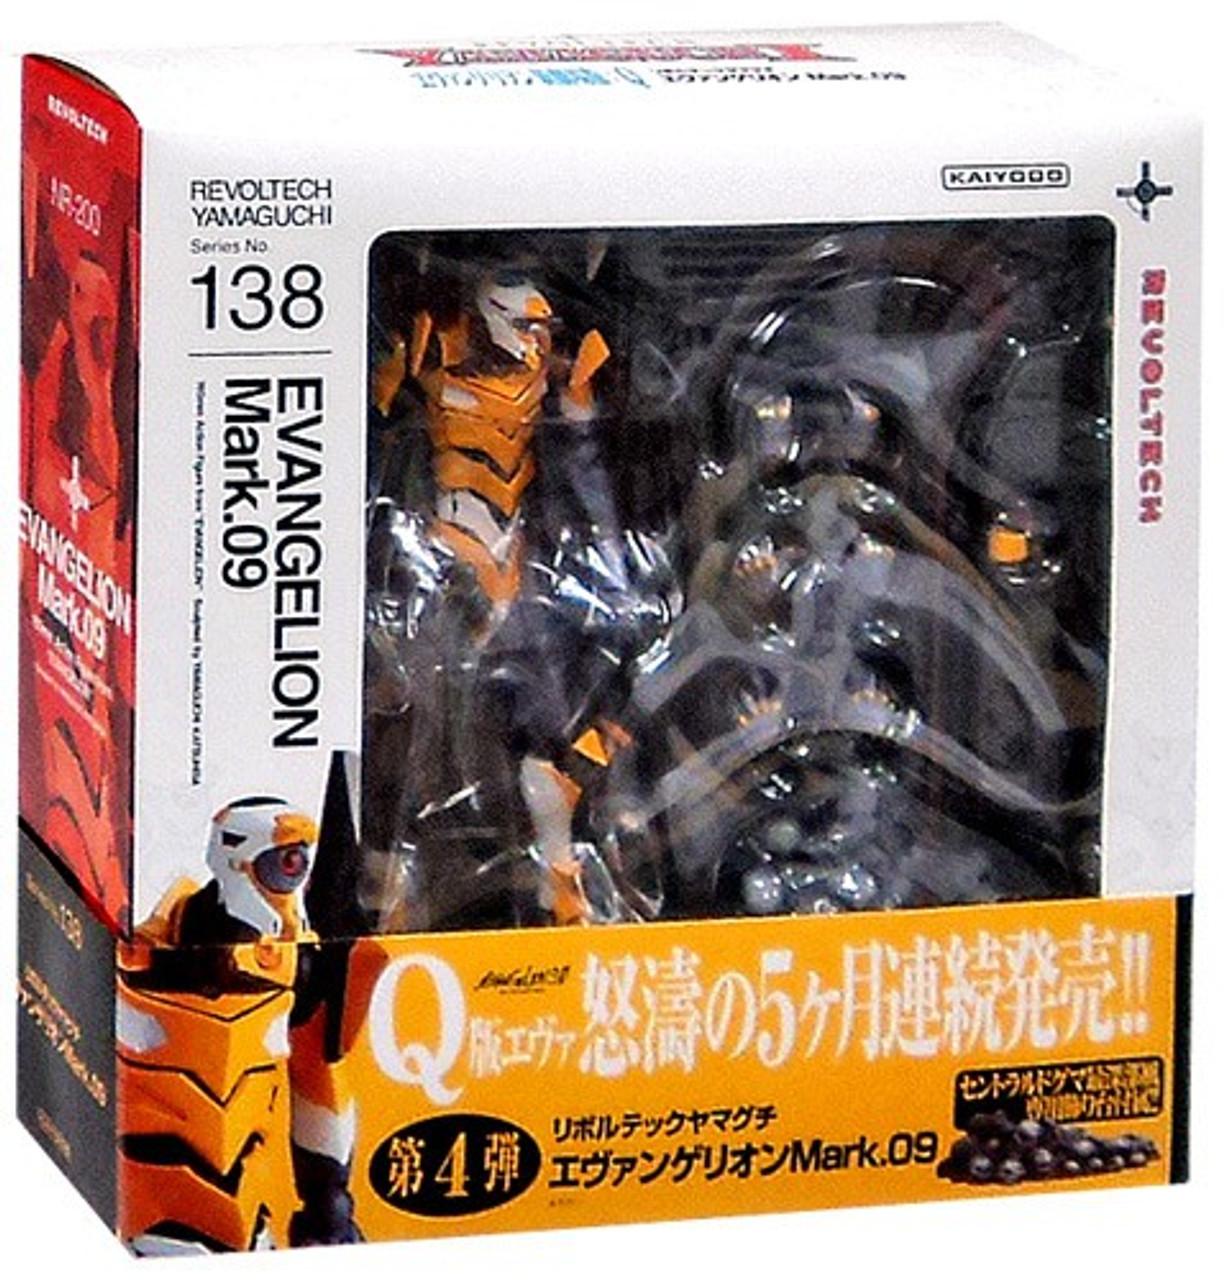 Evangelion 3.0 You Can (Not) Redo Revoltech Yamaguchi EVA 09 Action Figure #138